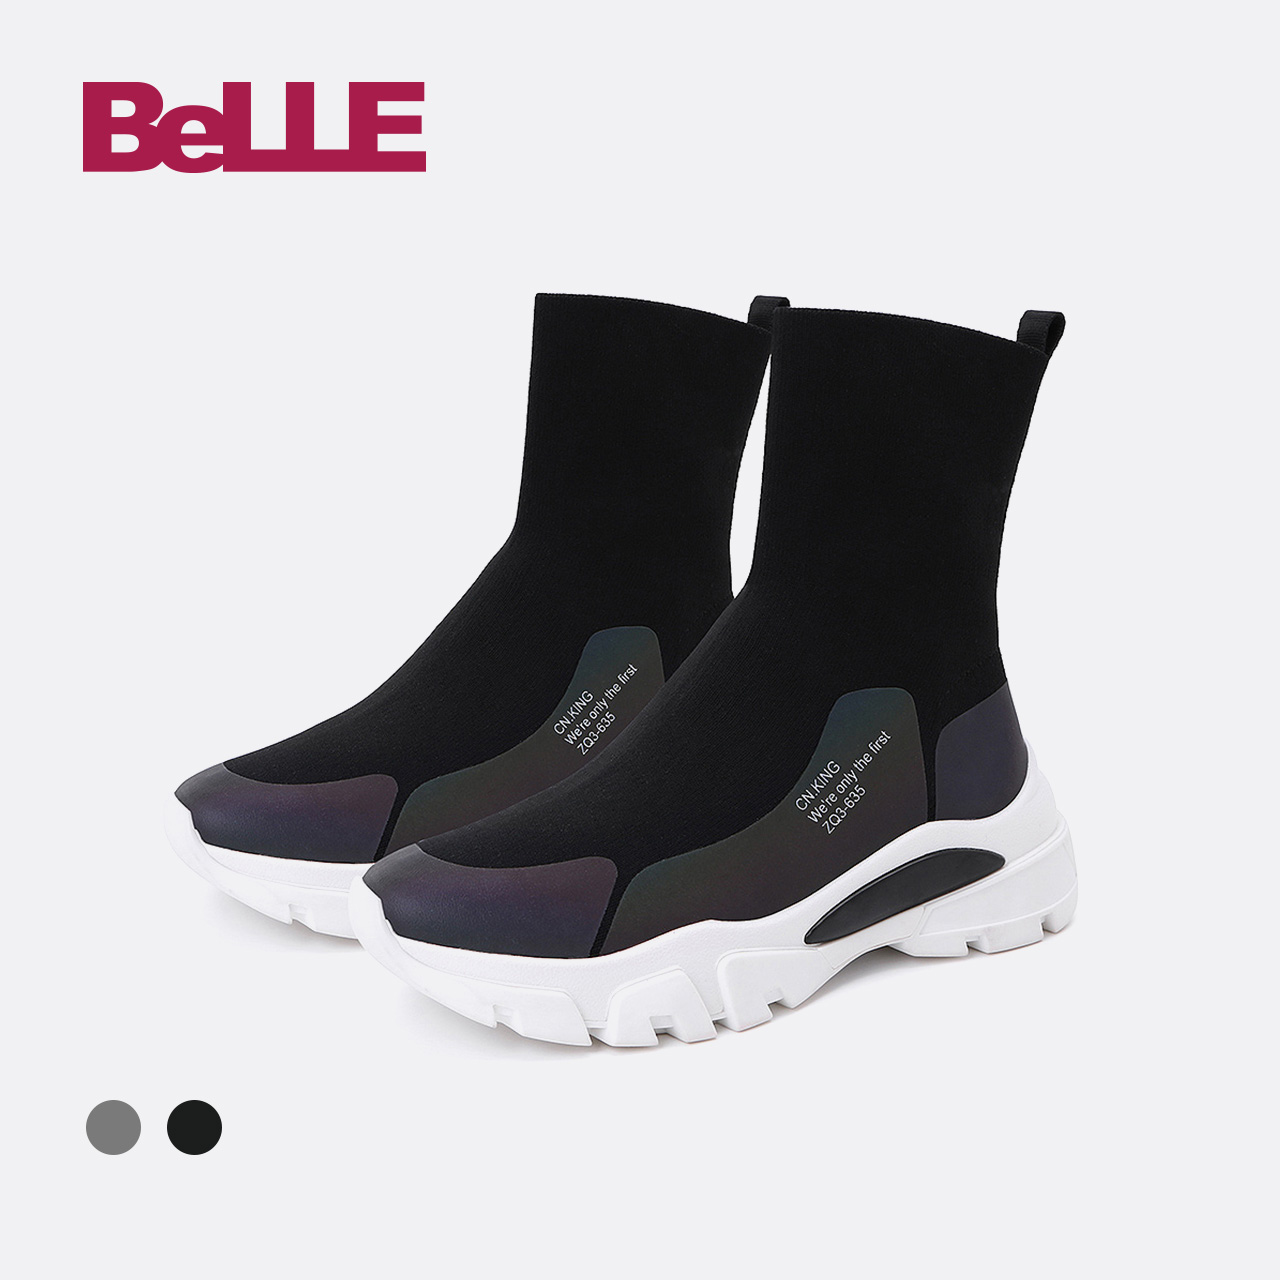 Belle-百丽女鞋厚底袜靴2018冬商场新款女旅游靴短靴T2F1DDD8